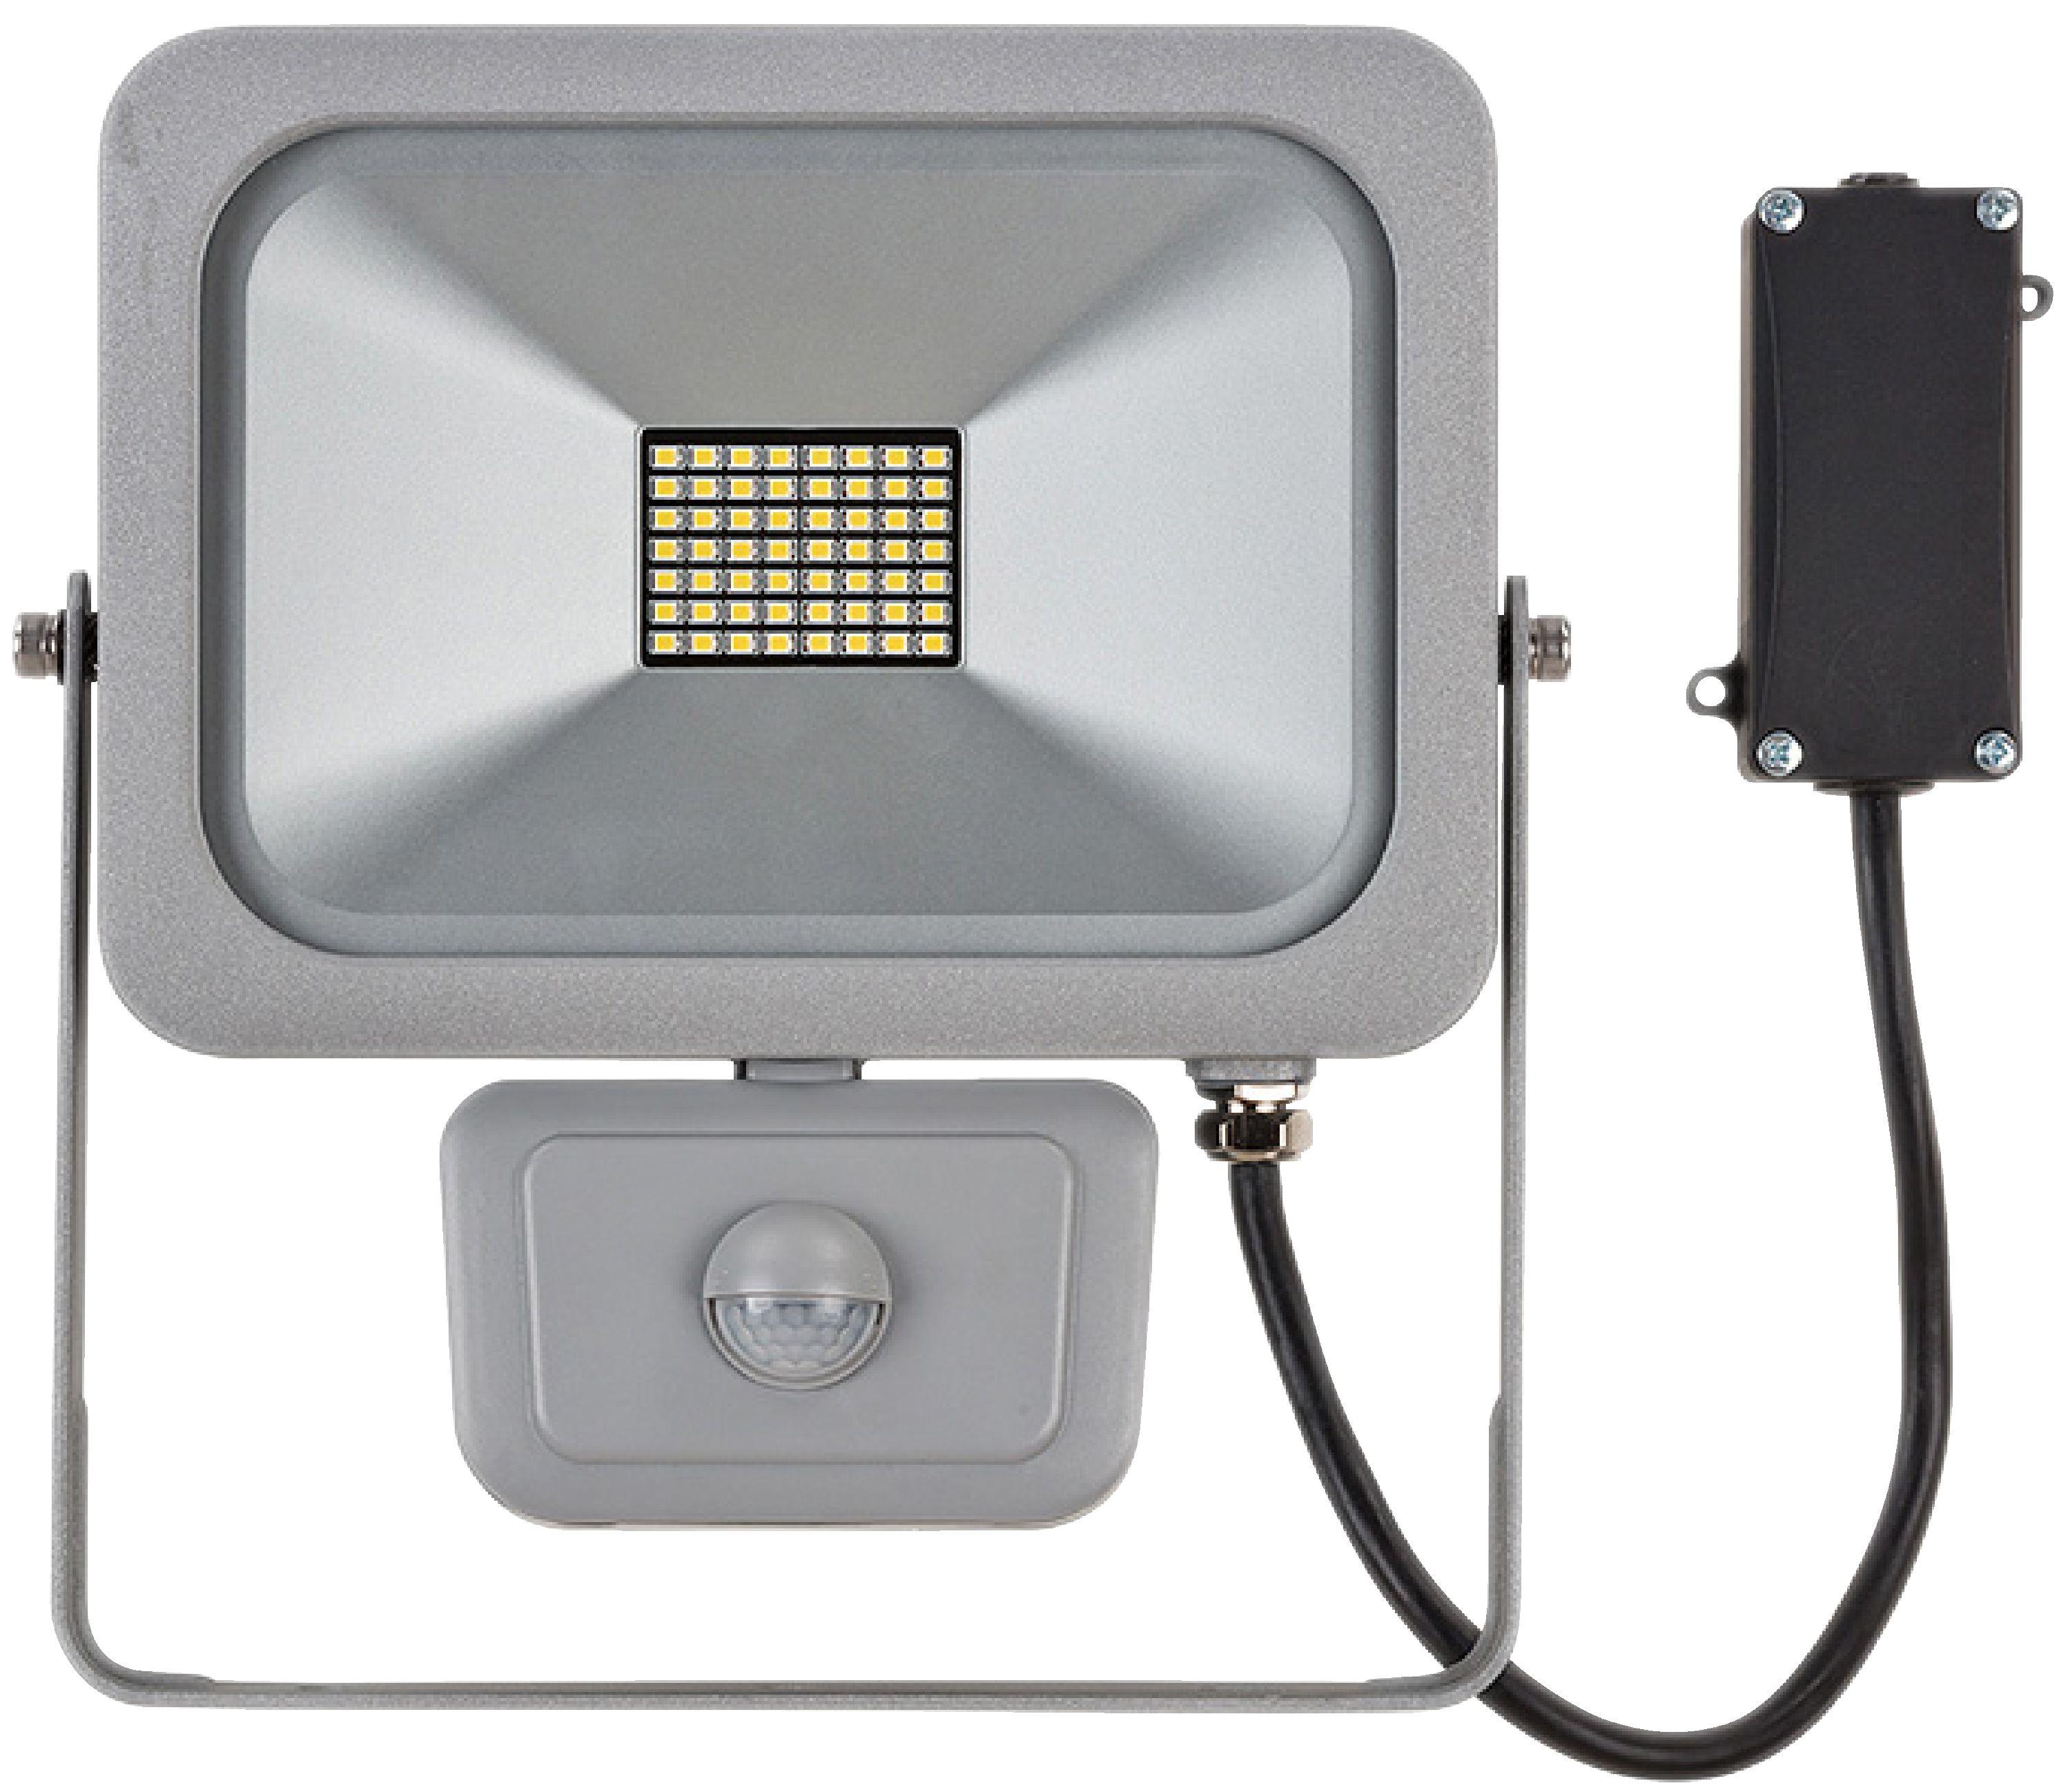 Brennenstuhl 1172900301 LED reflektor 30 W 2530 lm s čidlem pohybu